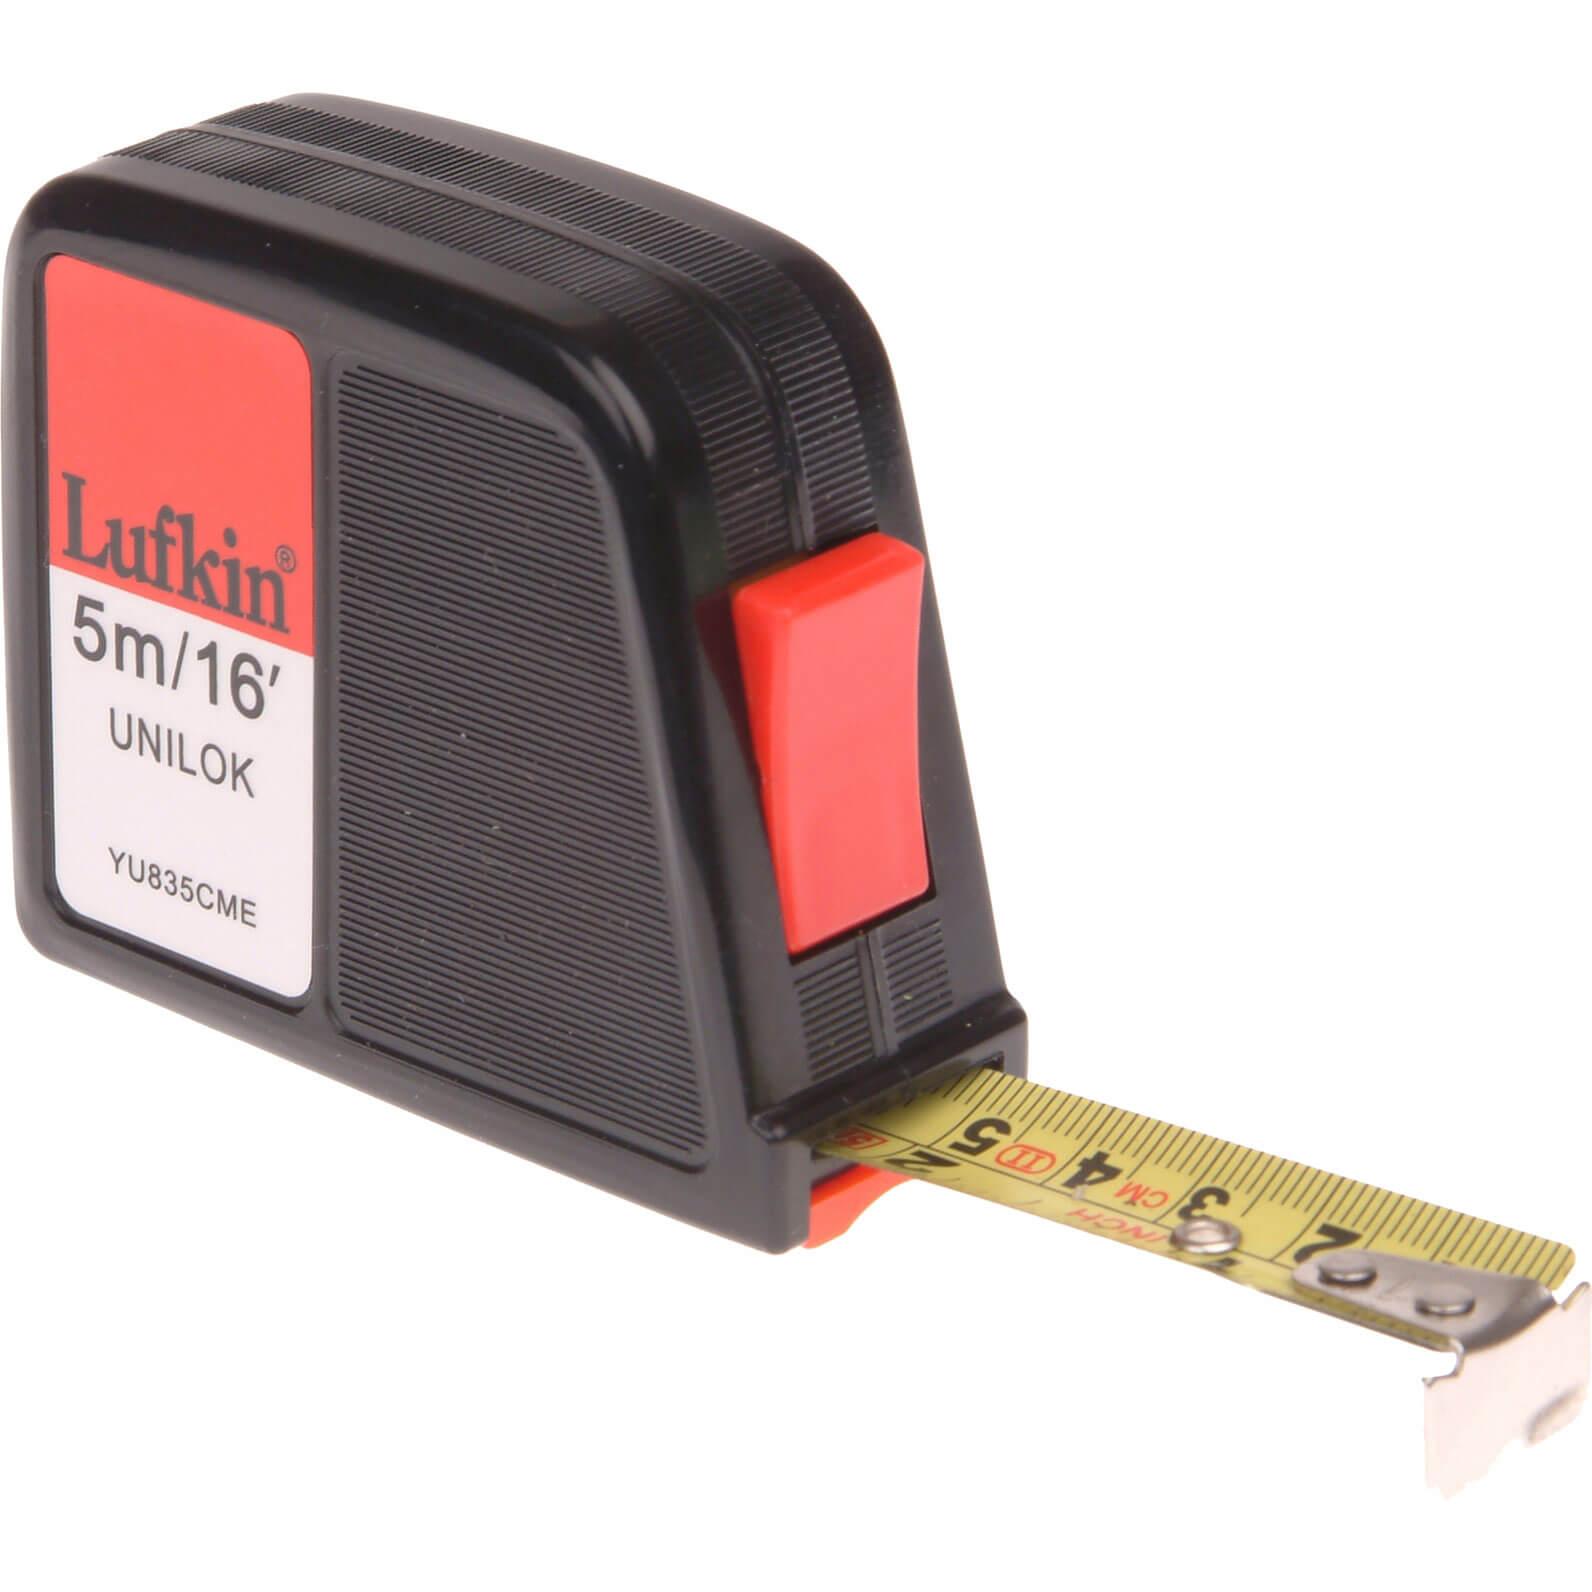 Image of Lufkin Unilok Tape Measure Imperial & Metric 16ft / 5m 19mm